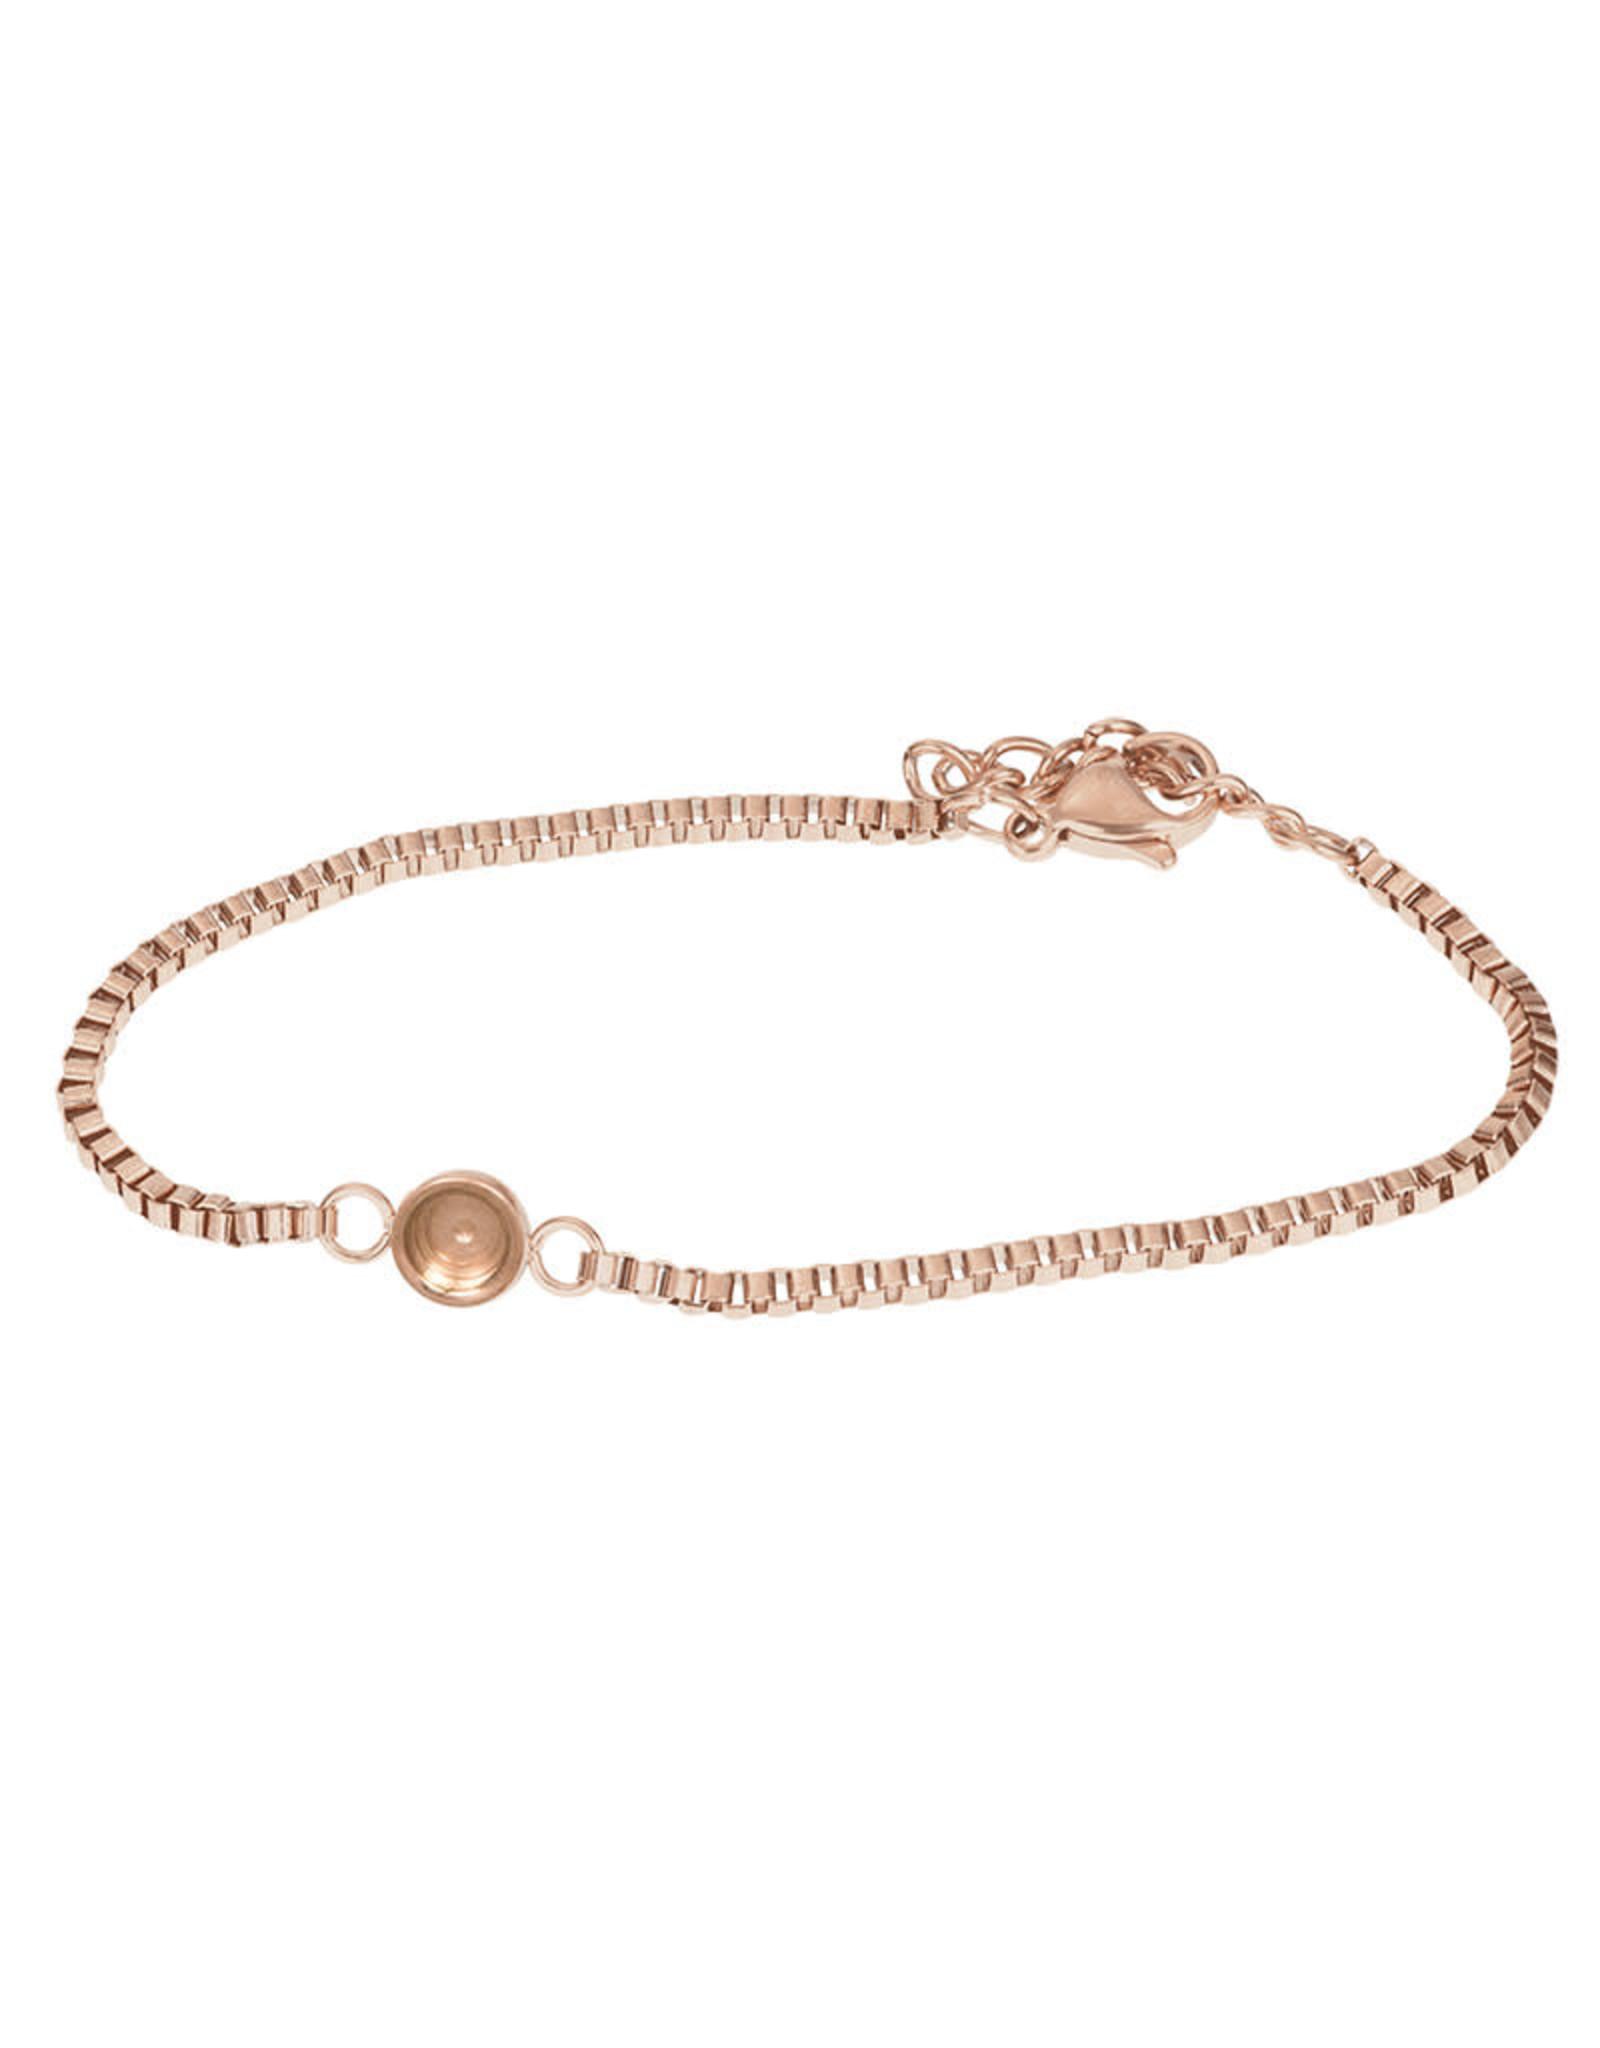 iXXXi Jewelry iXXXi top part base armband